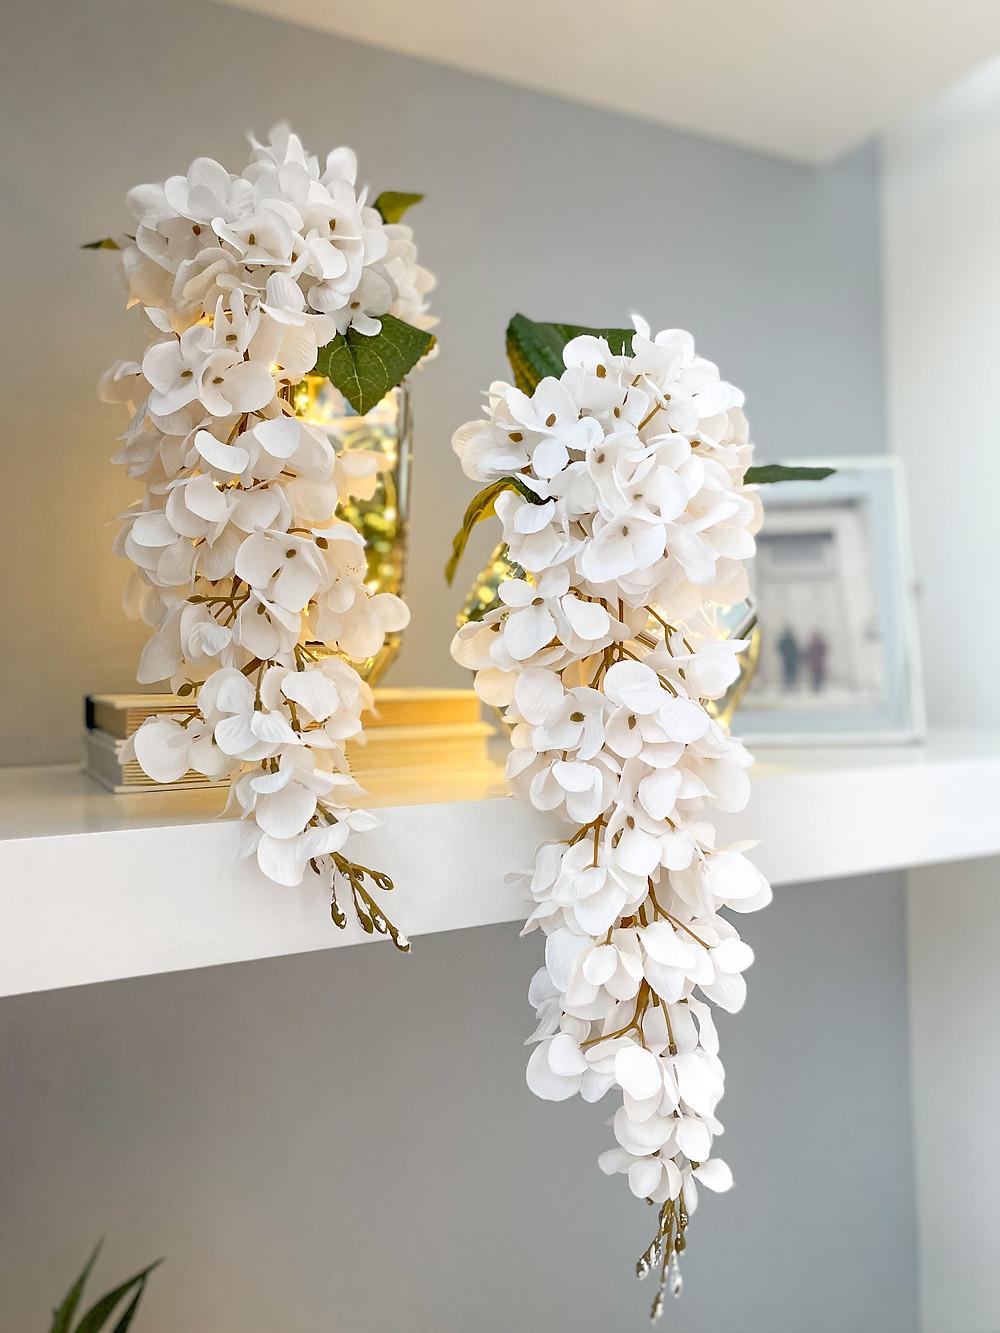 Easy Breezy Modern Minimalist Shelf Styling For The Summer Months #summerstyle #homedecor